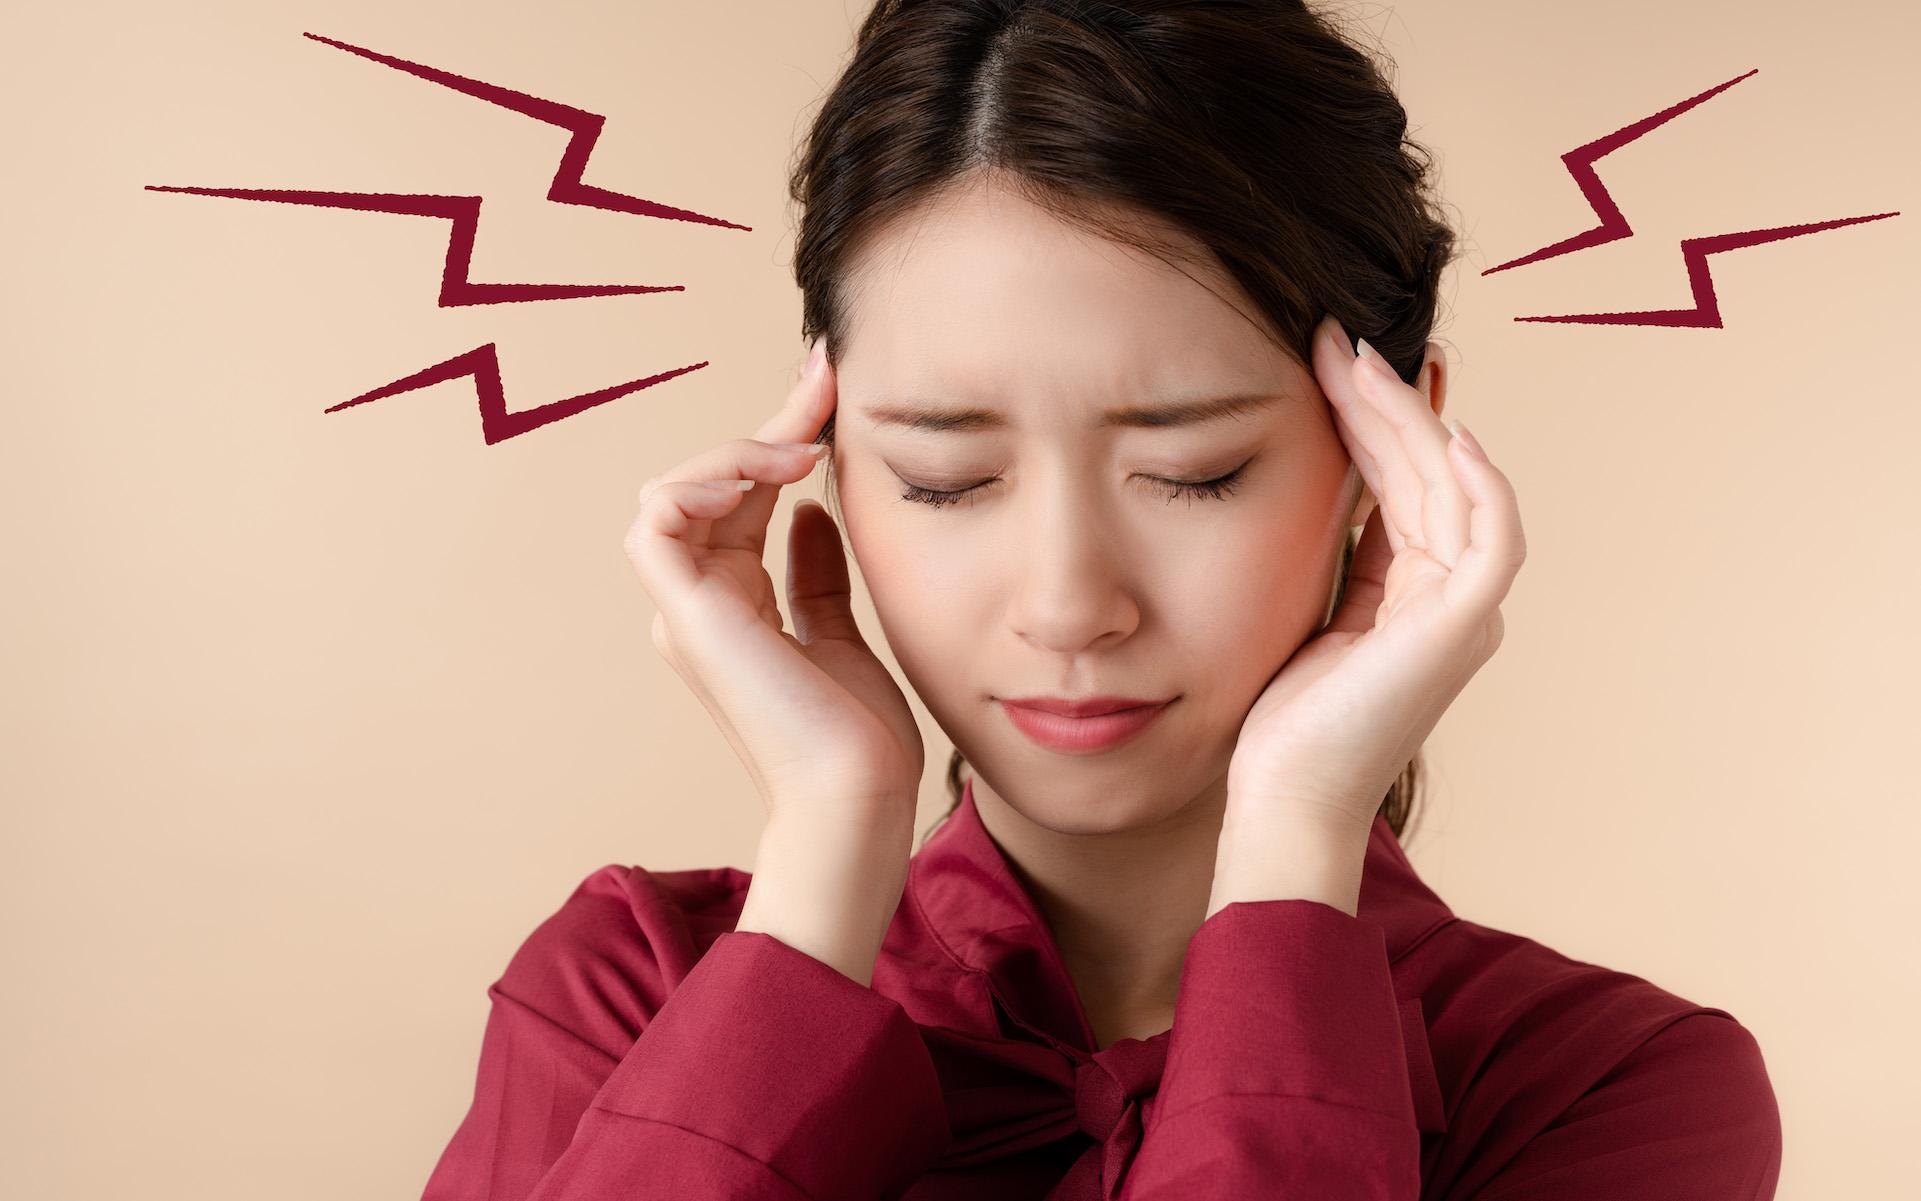 cannabis topicals headache migraine; woman rubbing temples